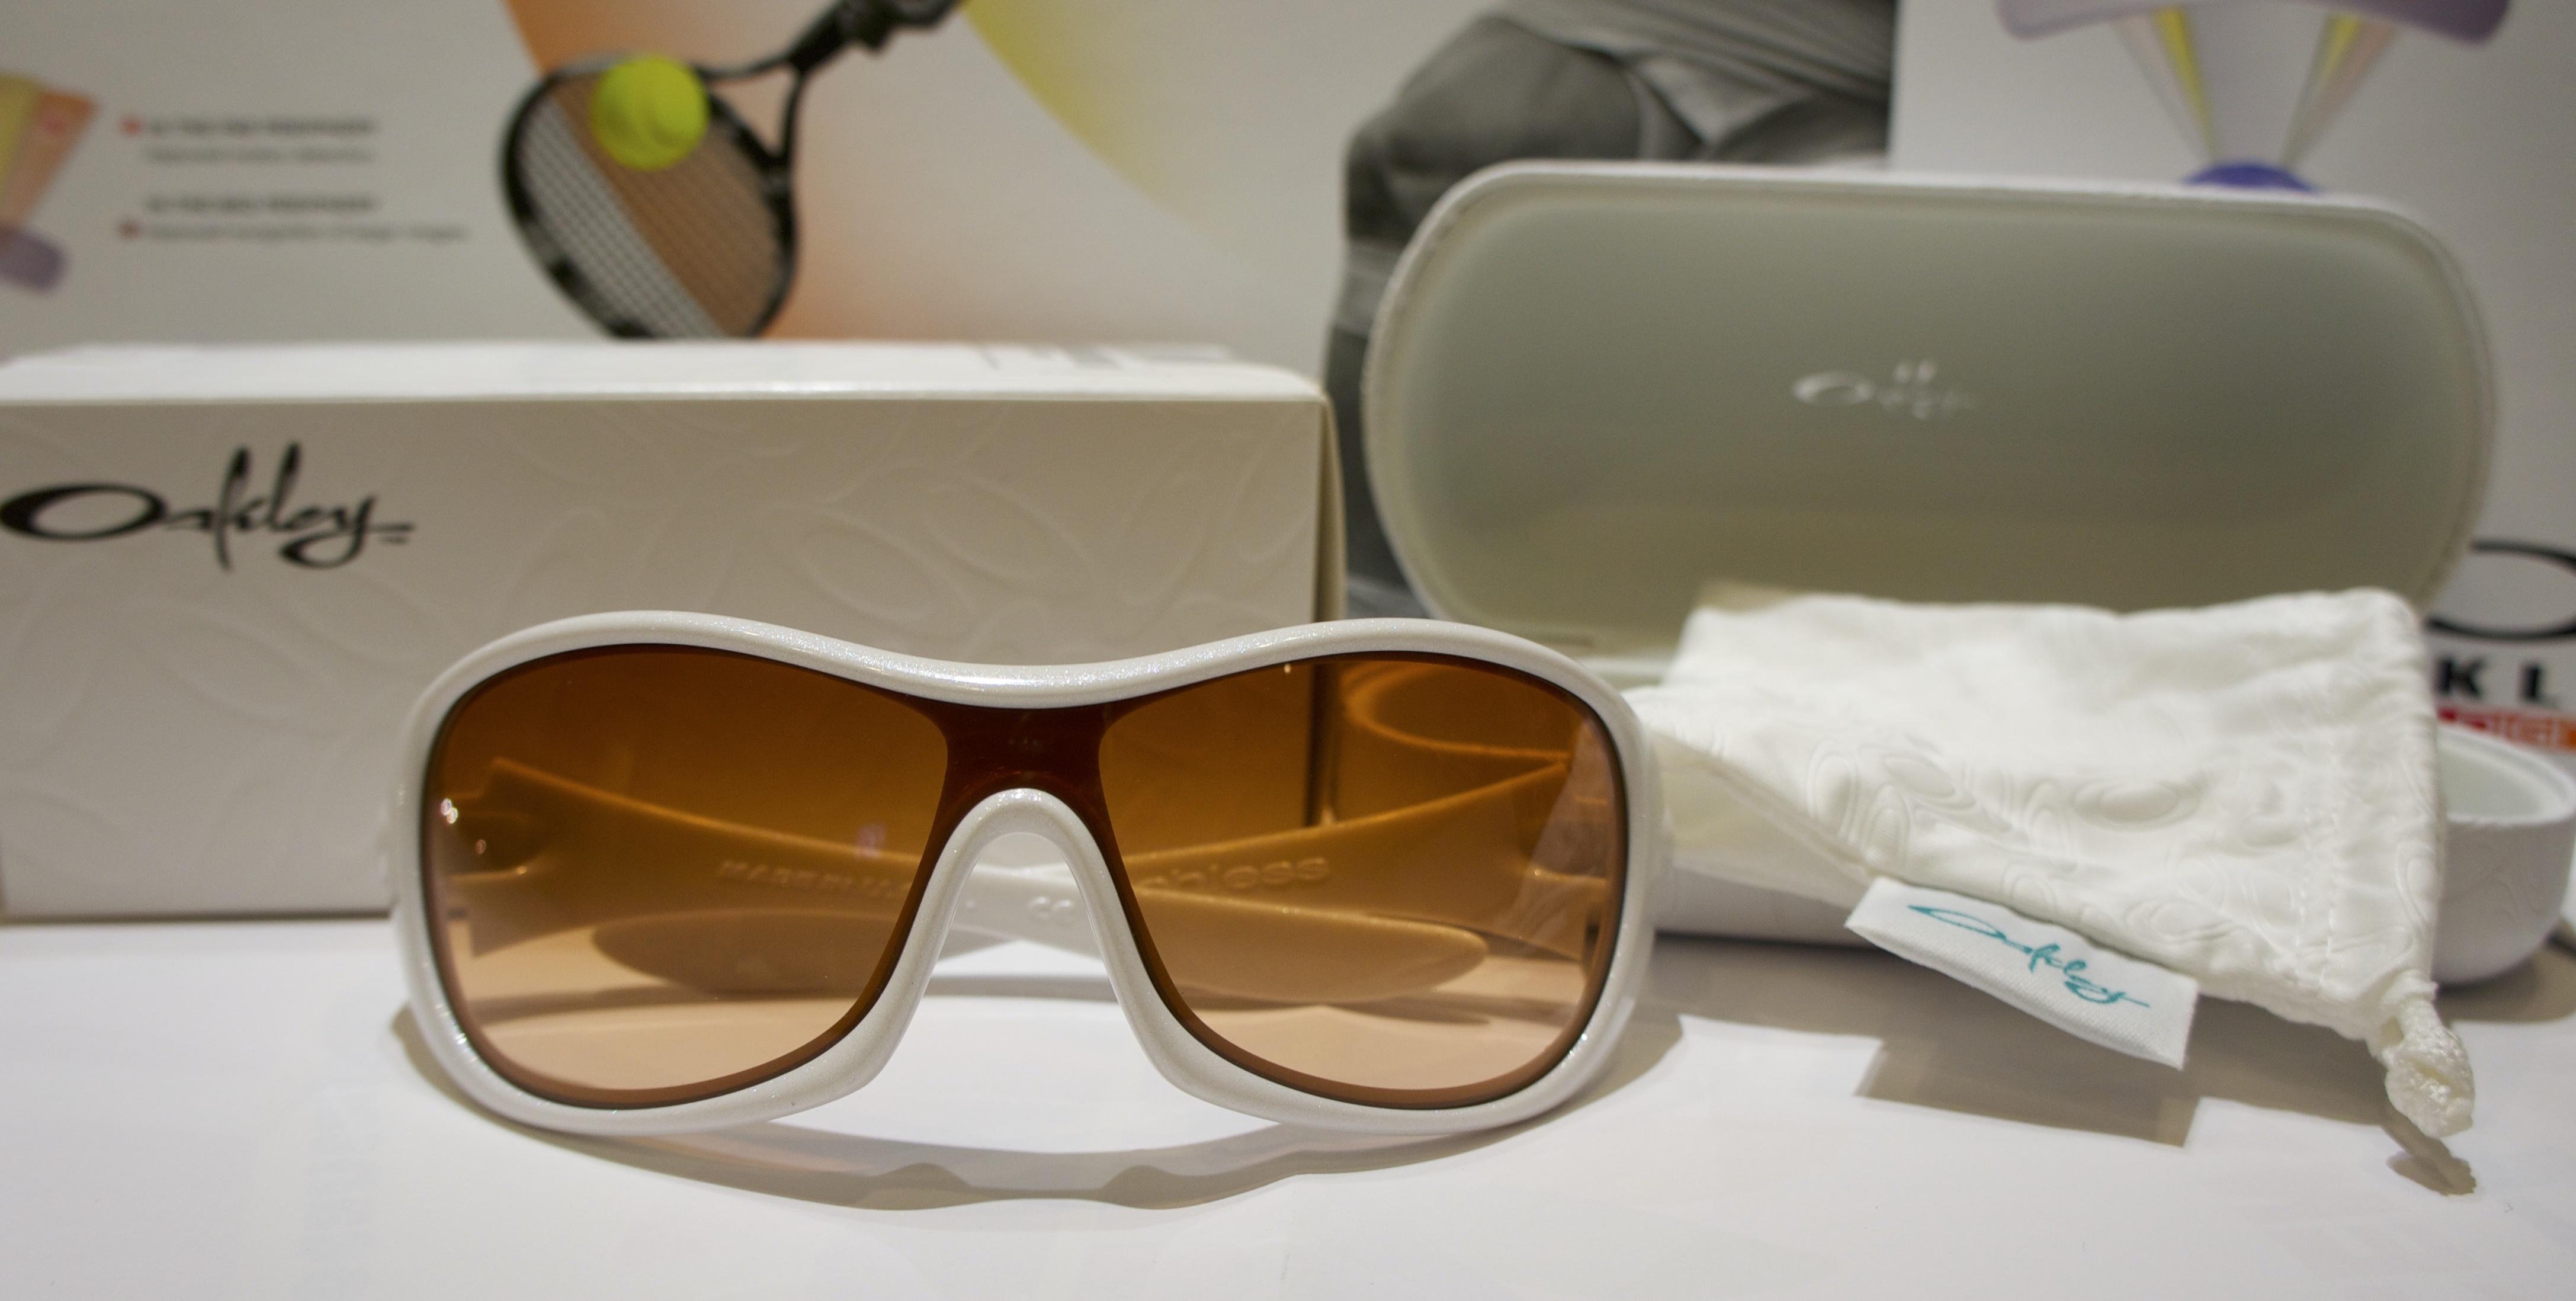 Oakley Speechless - Pearl - VR50 Brown Iridium (difettato) 9037 03-580